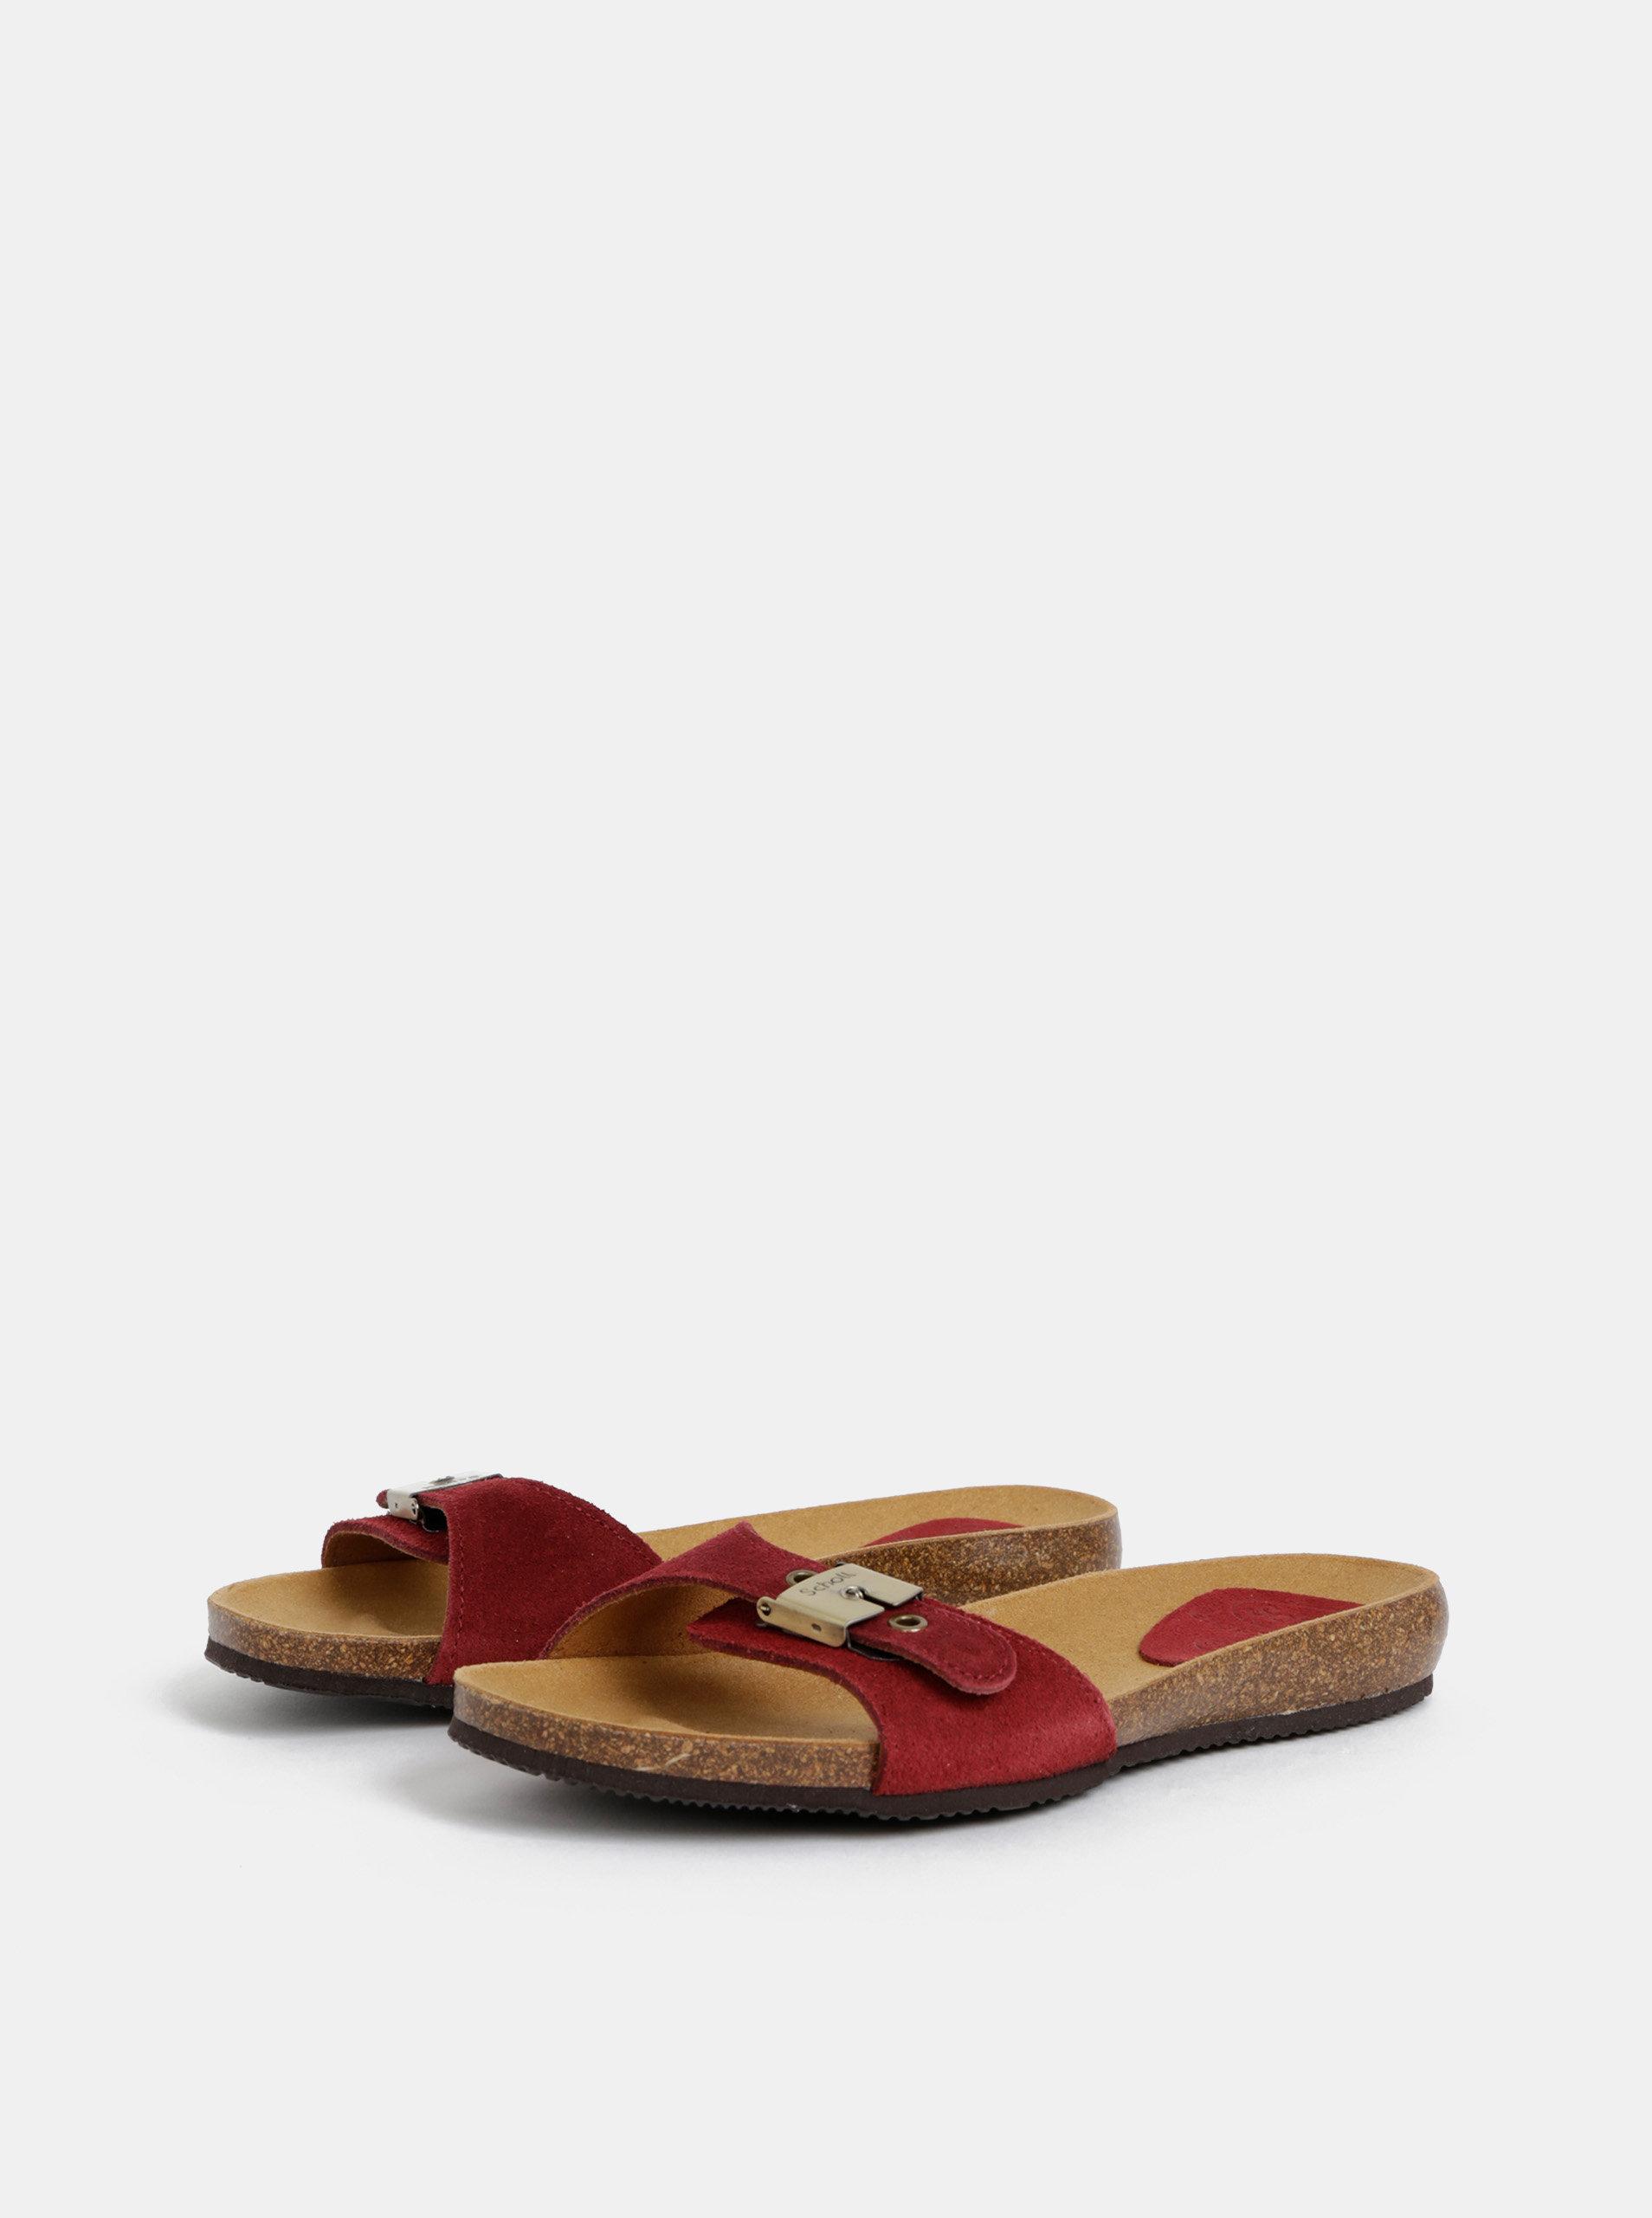 269819624ca4 Vínové dámské semišové pantofle Scholl Bahama ...